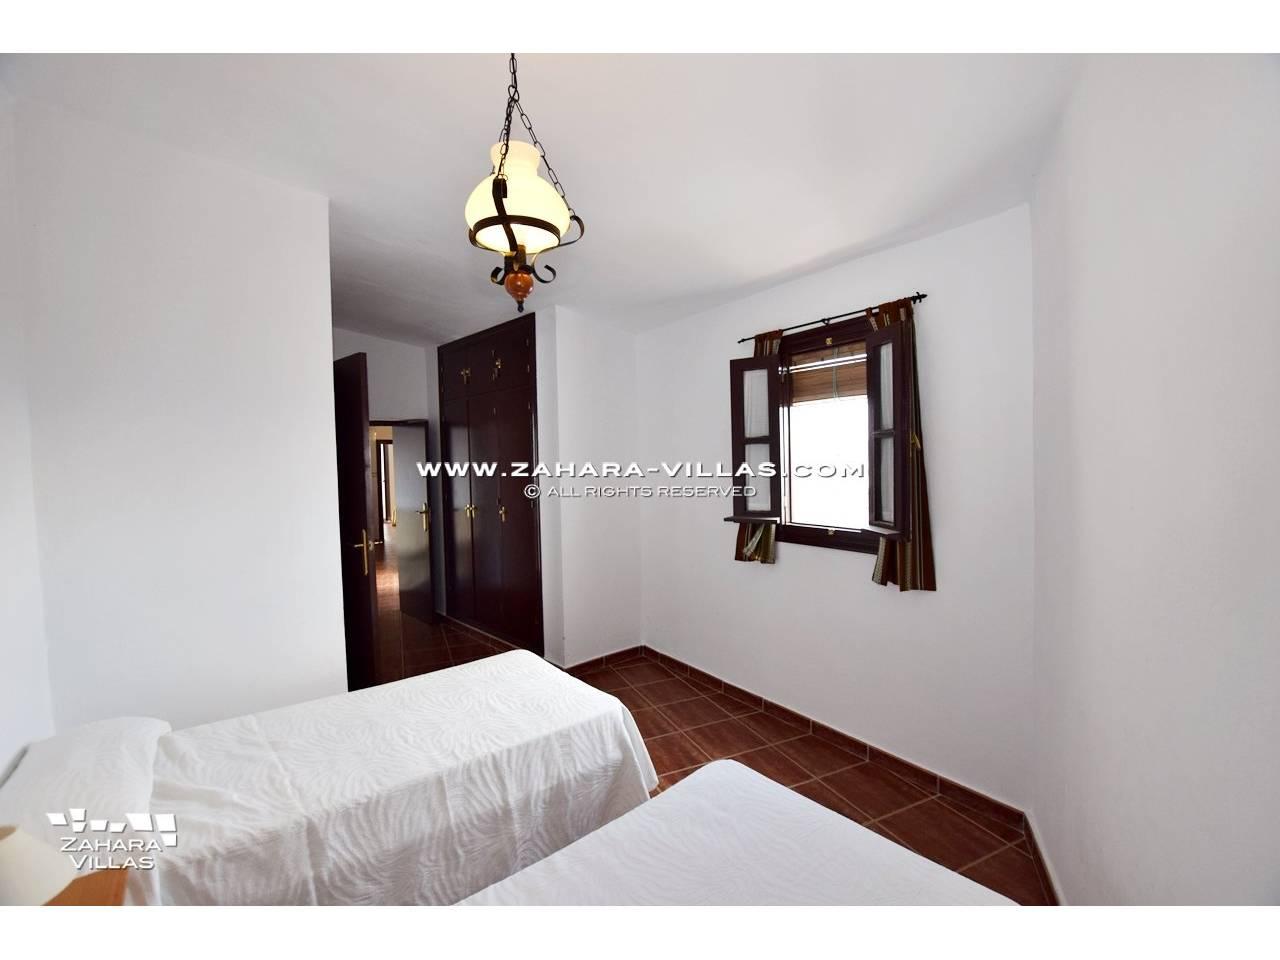 Imagen 6 de House, Apartment and Plot to build in the historic center of Vejer de la Frontera